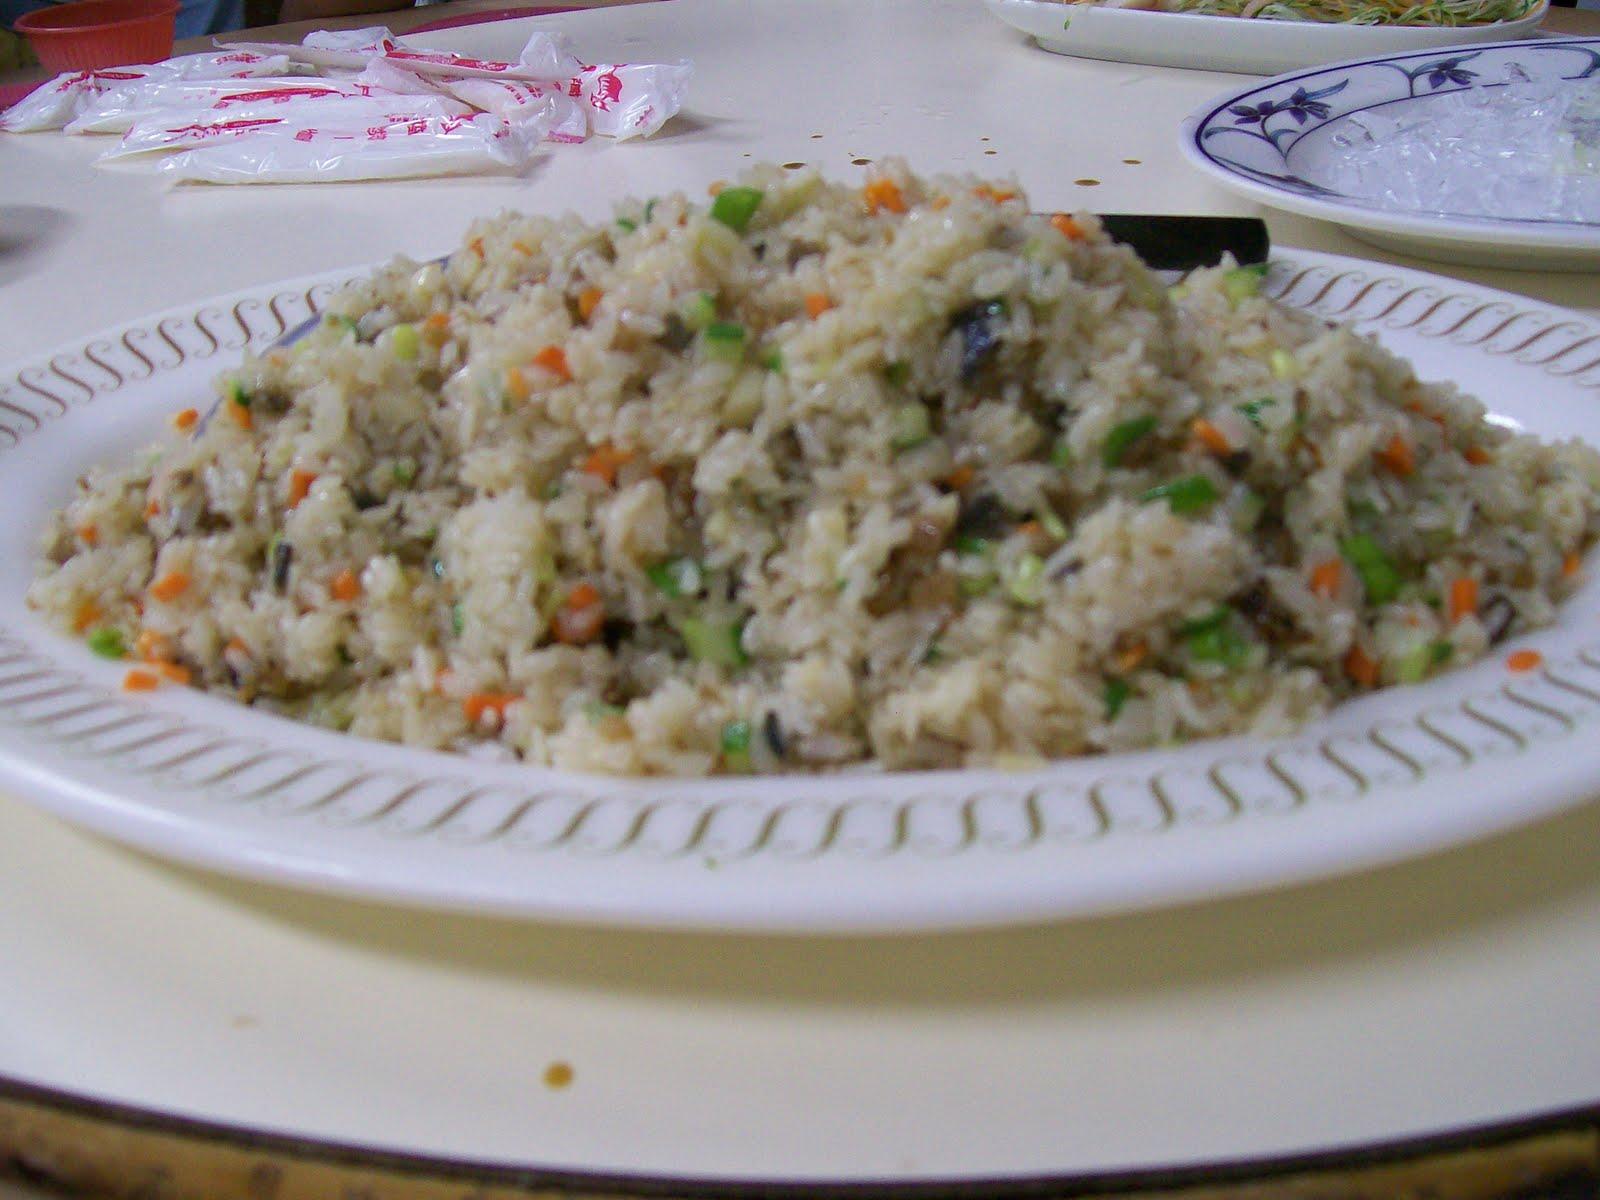 Ryanlei - Taiwan: [食記] 澎湖:龍門海鮮餐廳